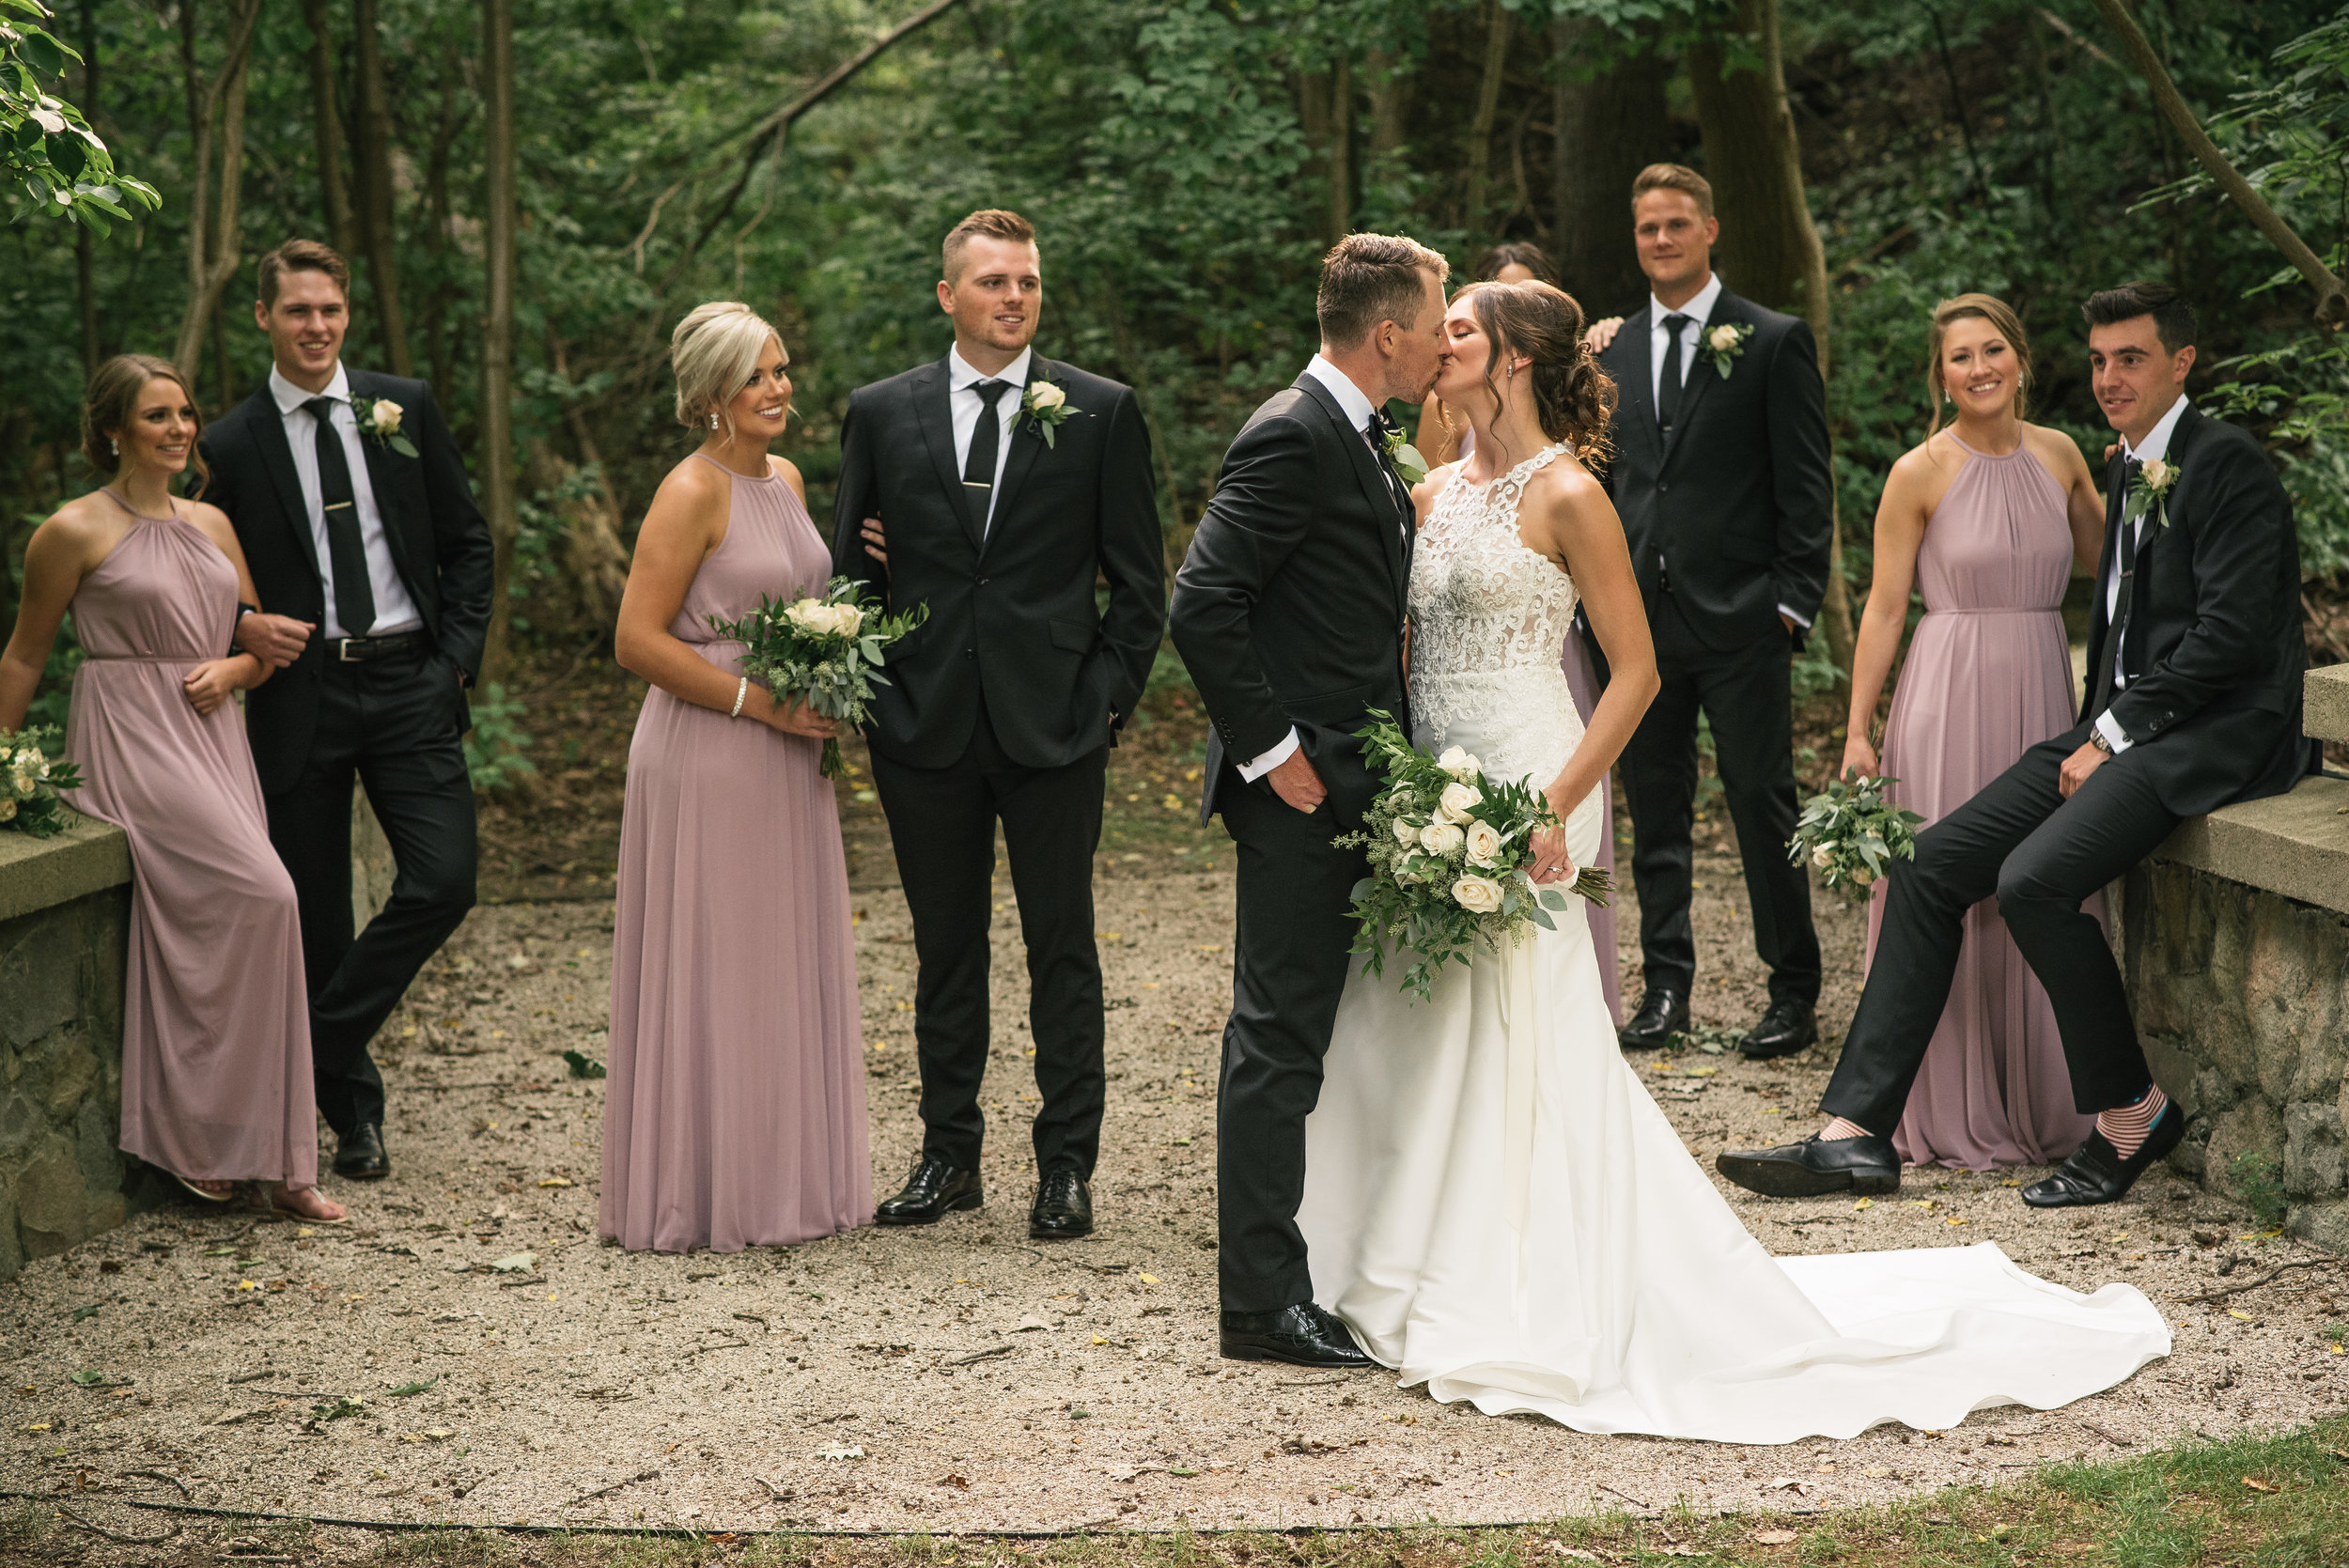 180824_KatieJake_Wedding_DSC_7811_sm.jpg